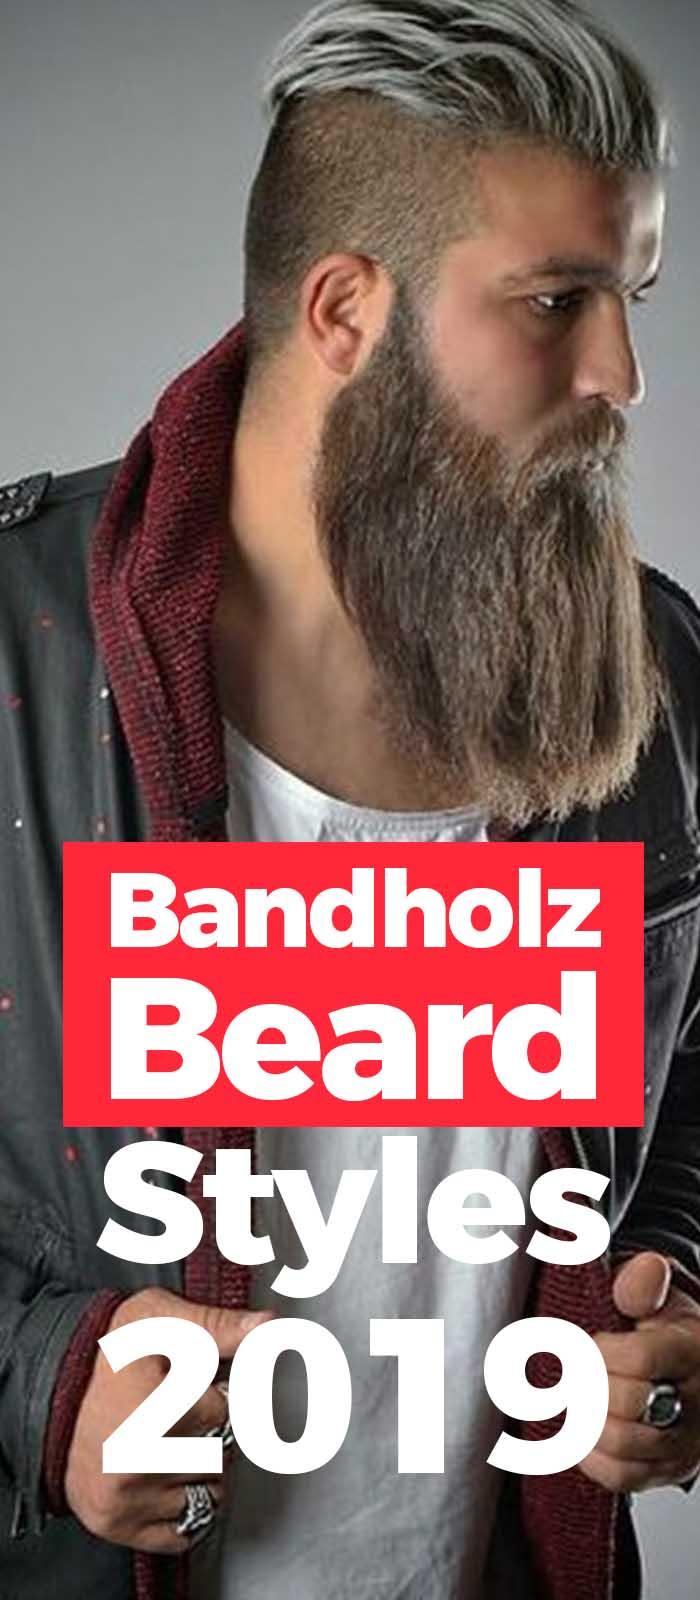 The Female Magnet – Bandholz Beard.